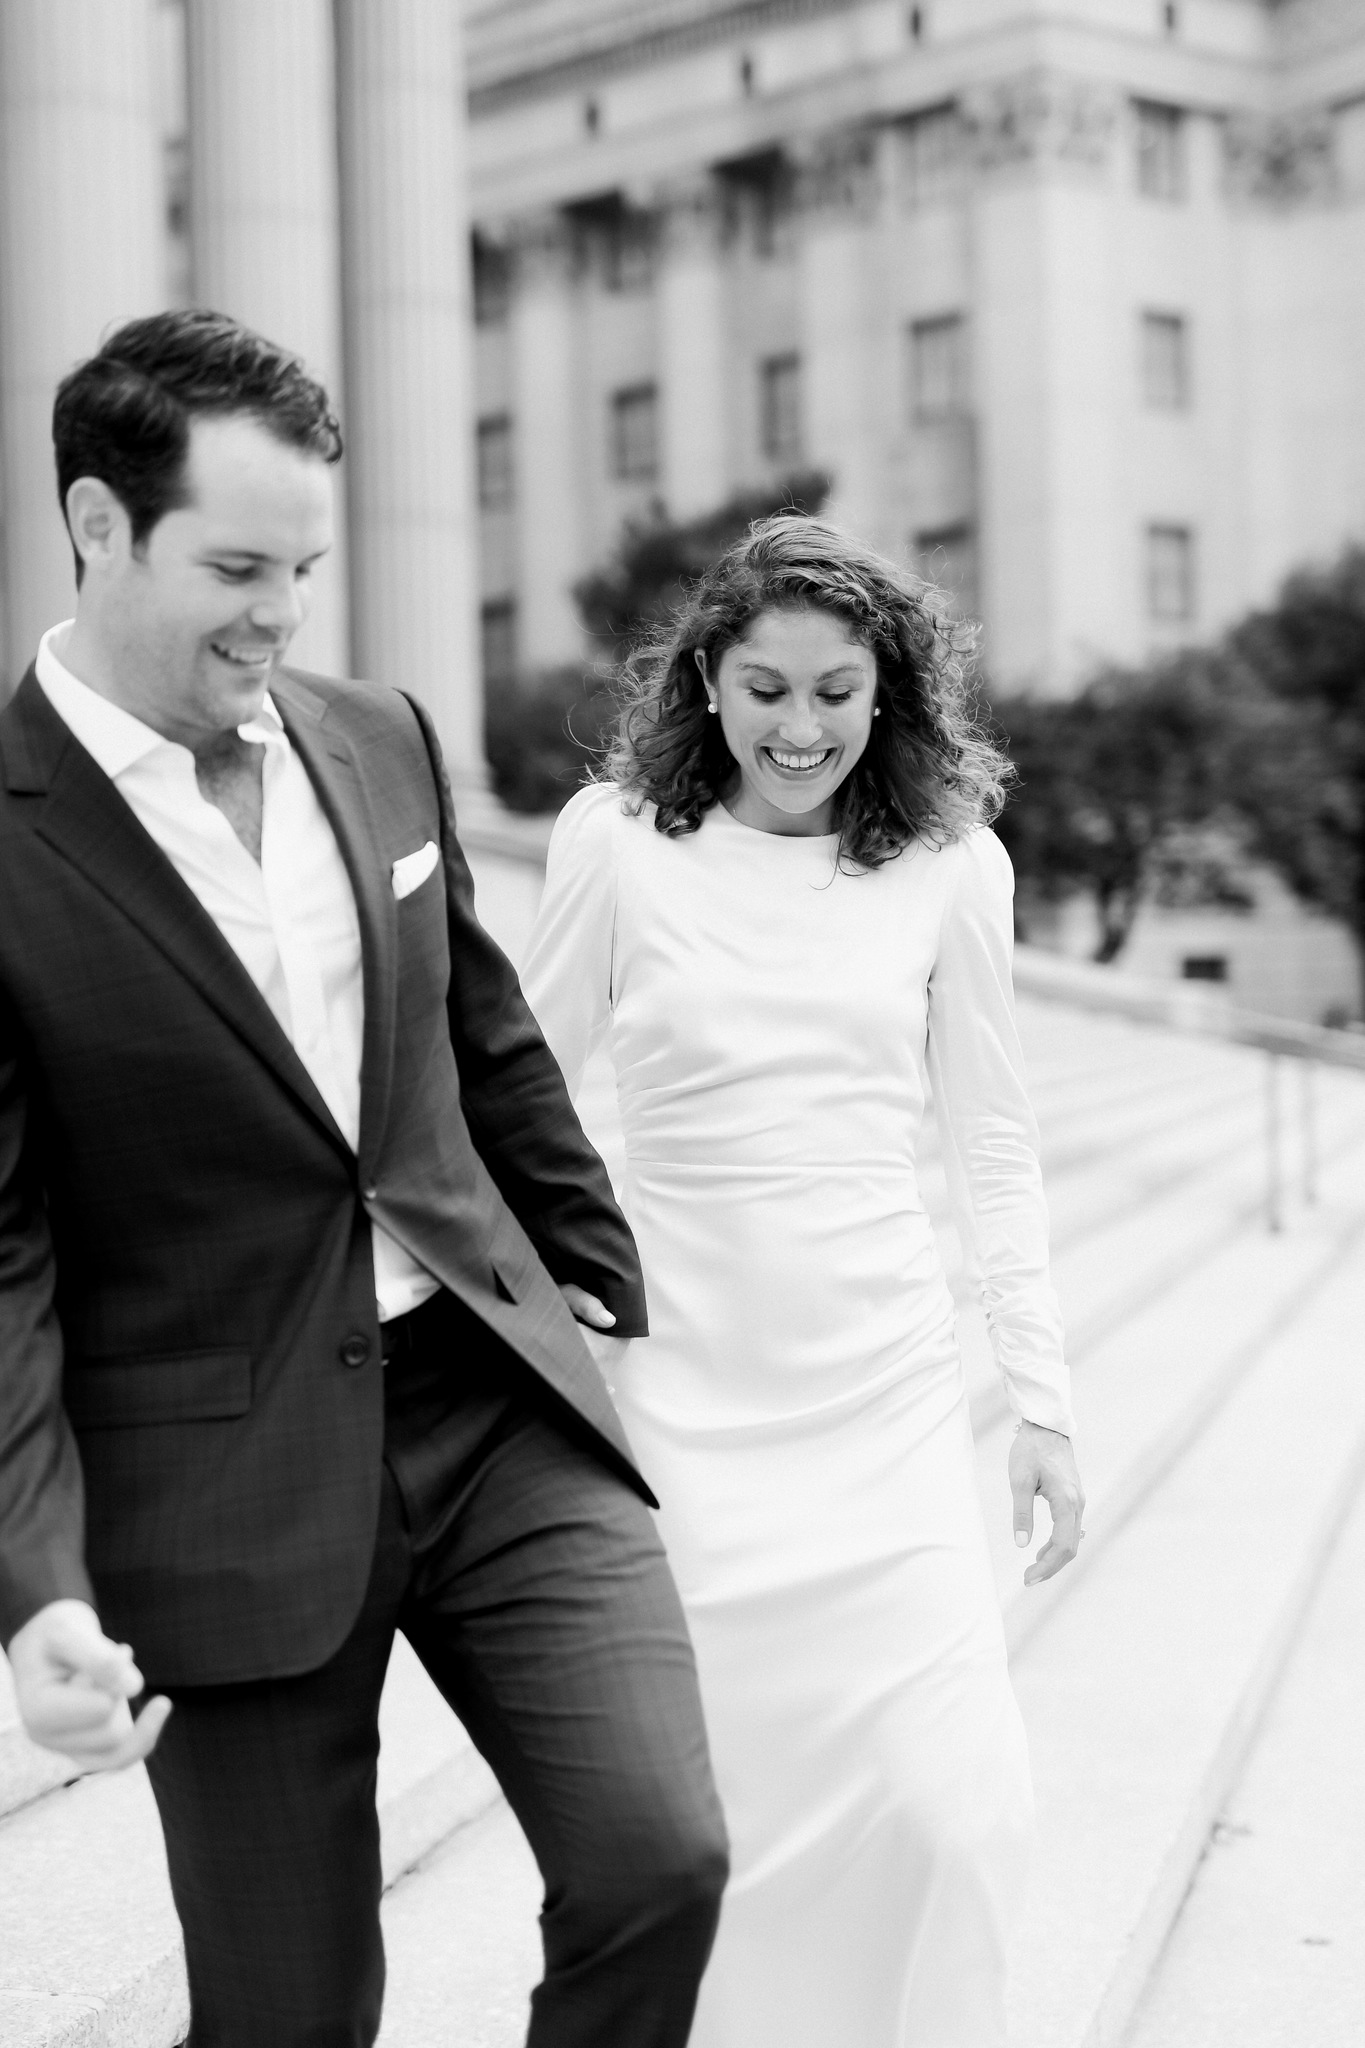 NY city hall wedding__ct wedding_ct wedding photographer-2.jpg